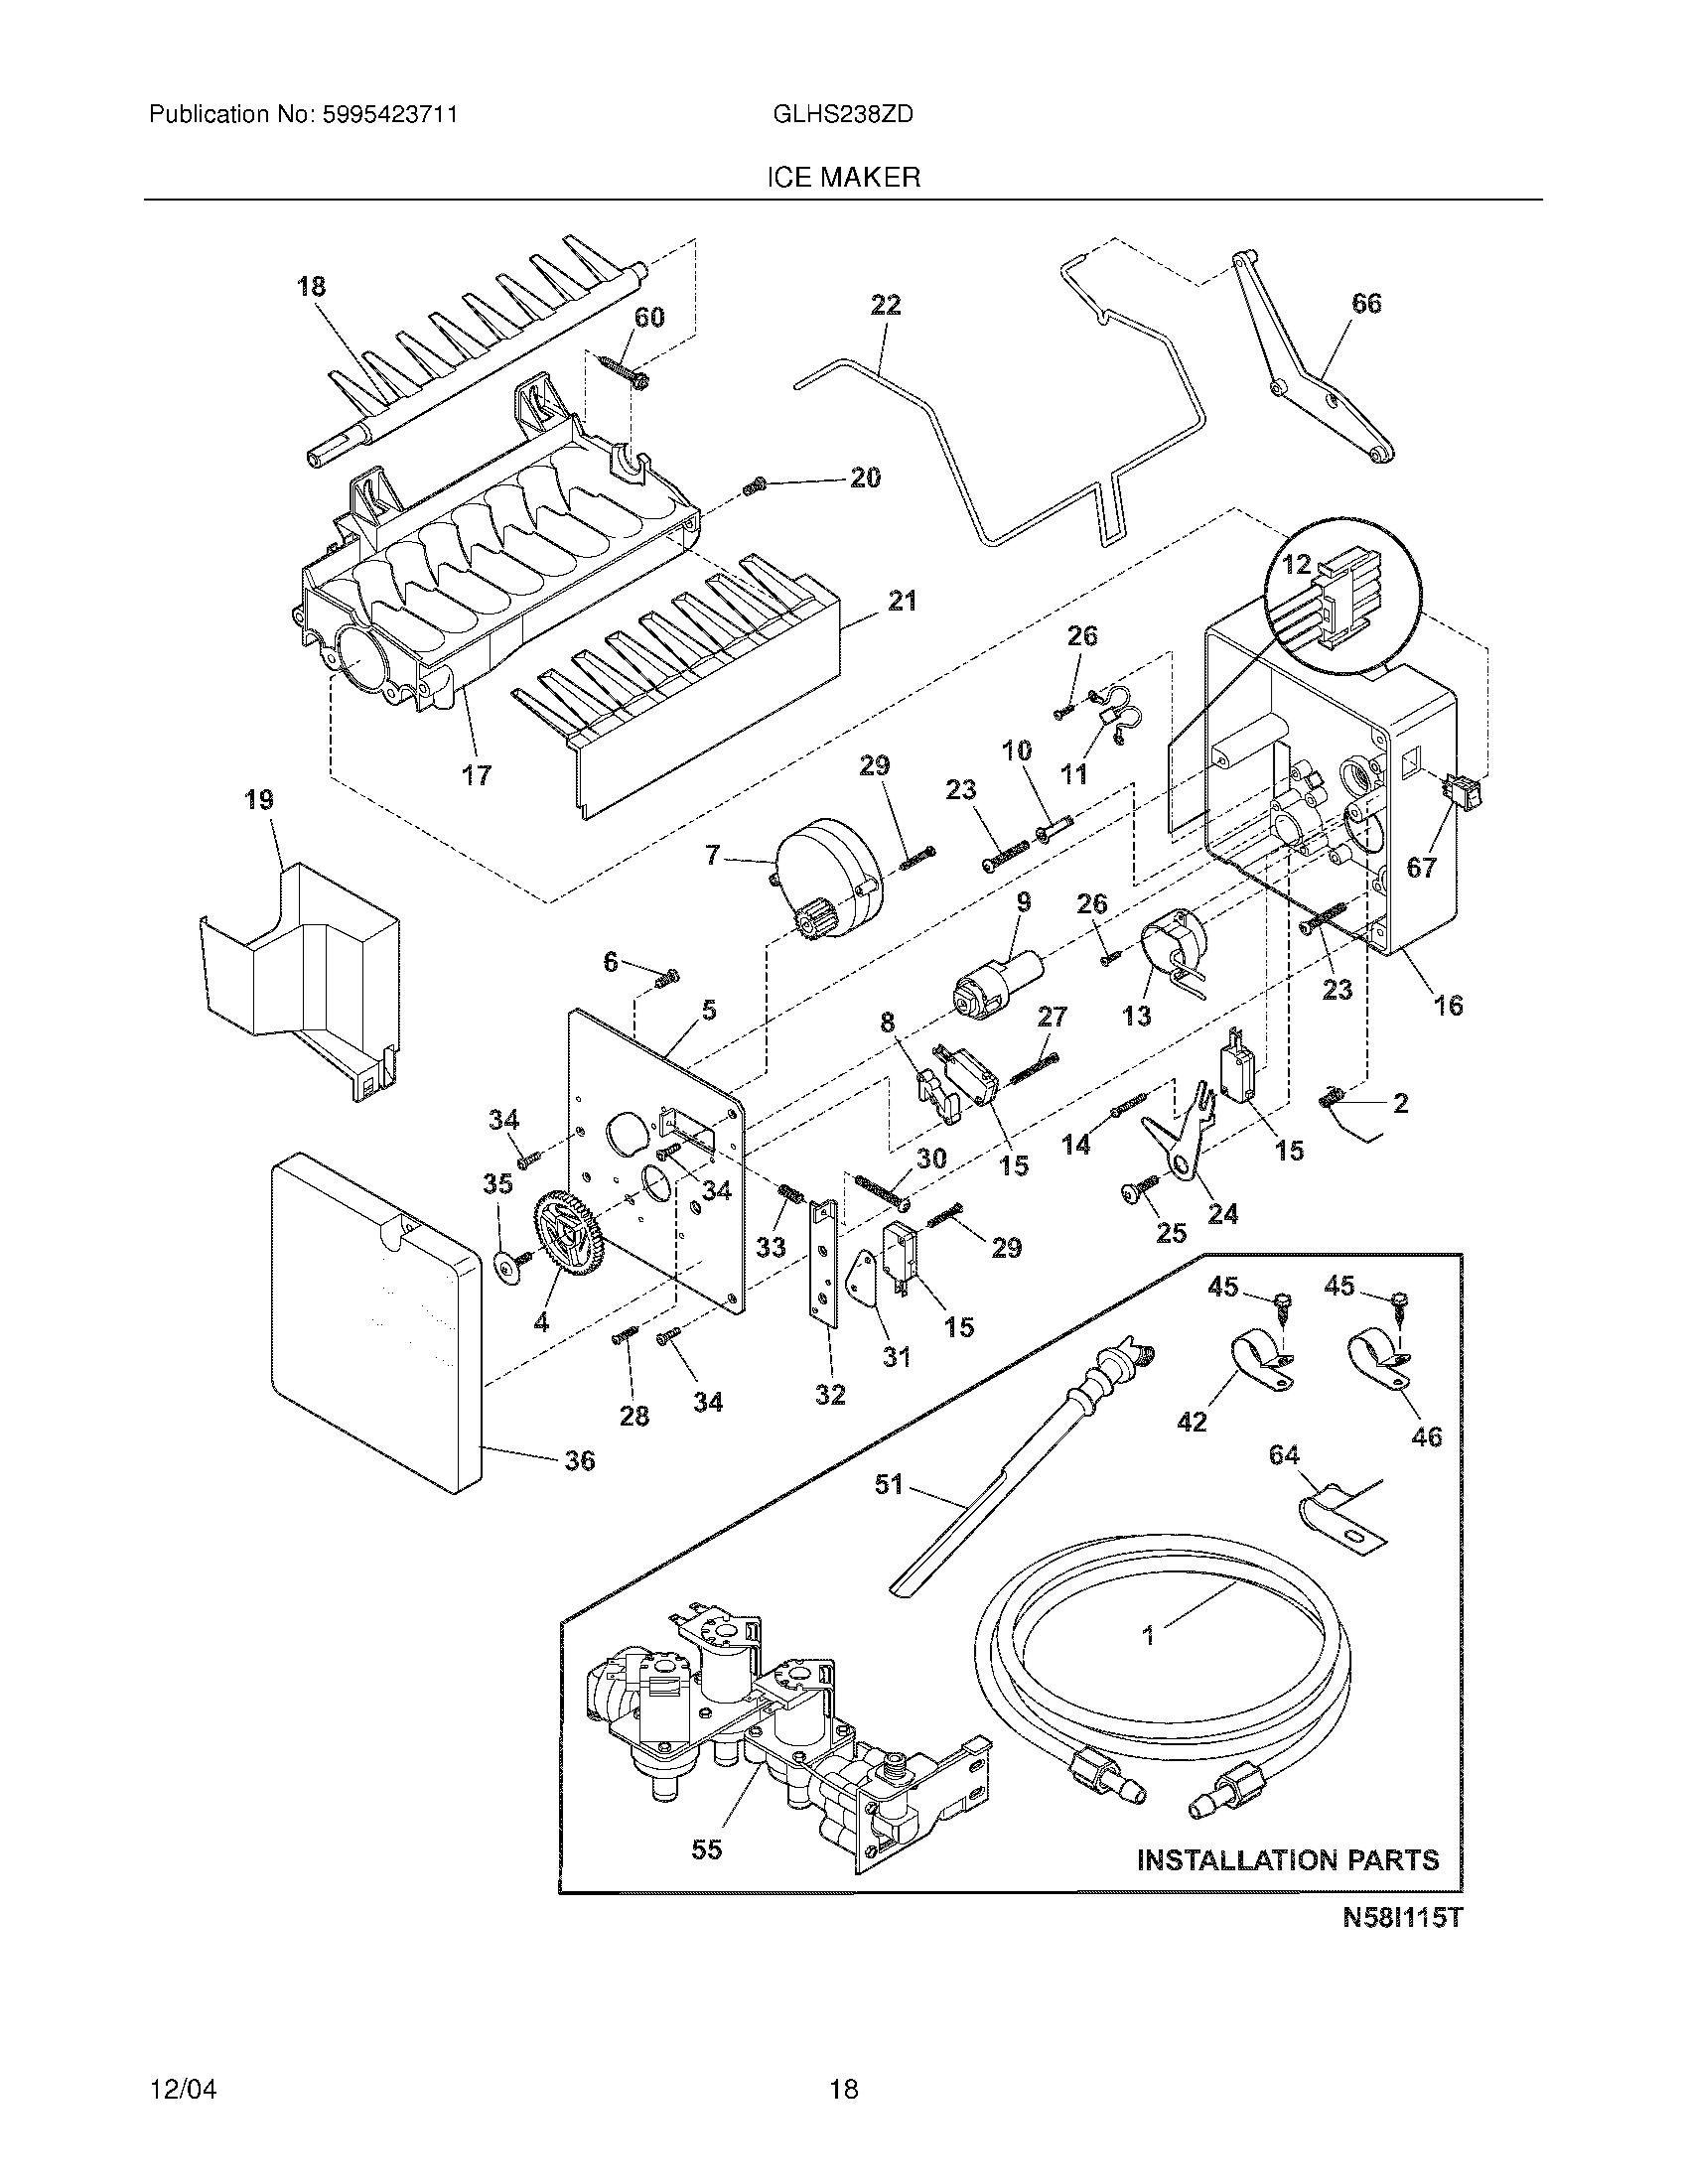 DIAGRAM] Whirlpool Refrigerator Schematic Diagram Gb22dkxjw01 FULL Version  HD Quality Diagram Gb22dkxjw01 - METROPOLITANAUDIOVIDEO.BEHENRY.FR   Whirlpool Refrigerator Schematic Diagram Gb22dkxjw01      metropolitanaudiovideo.behenry.fr